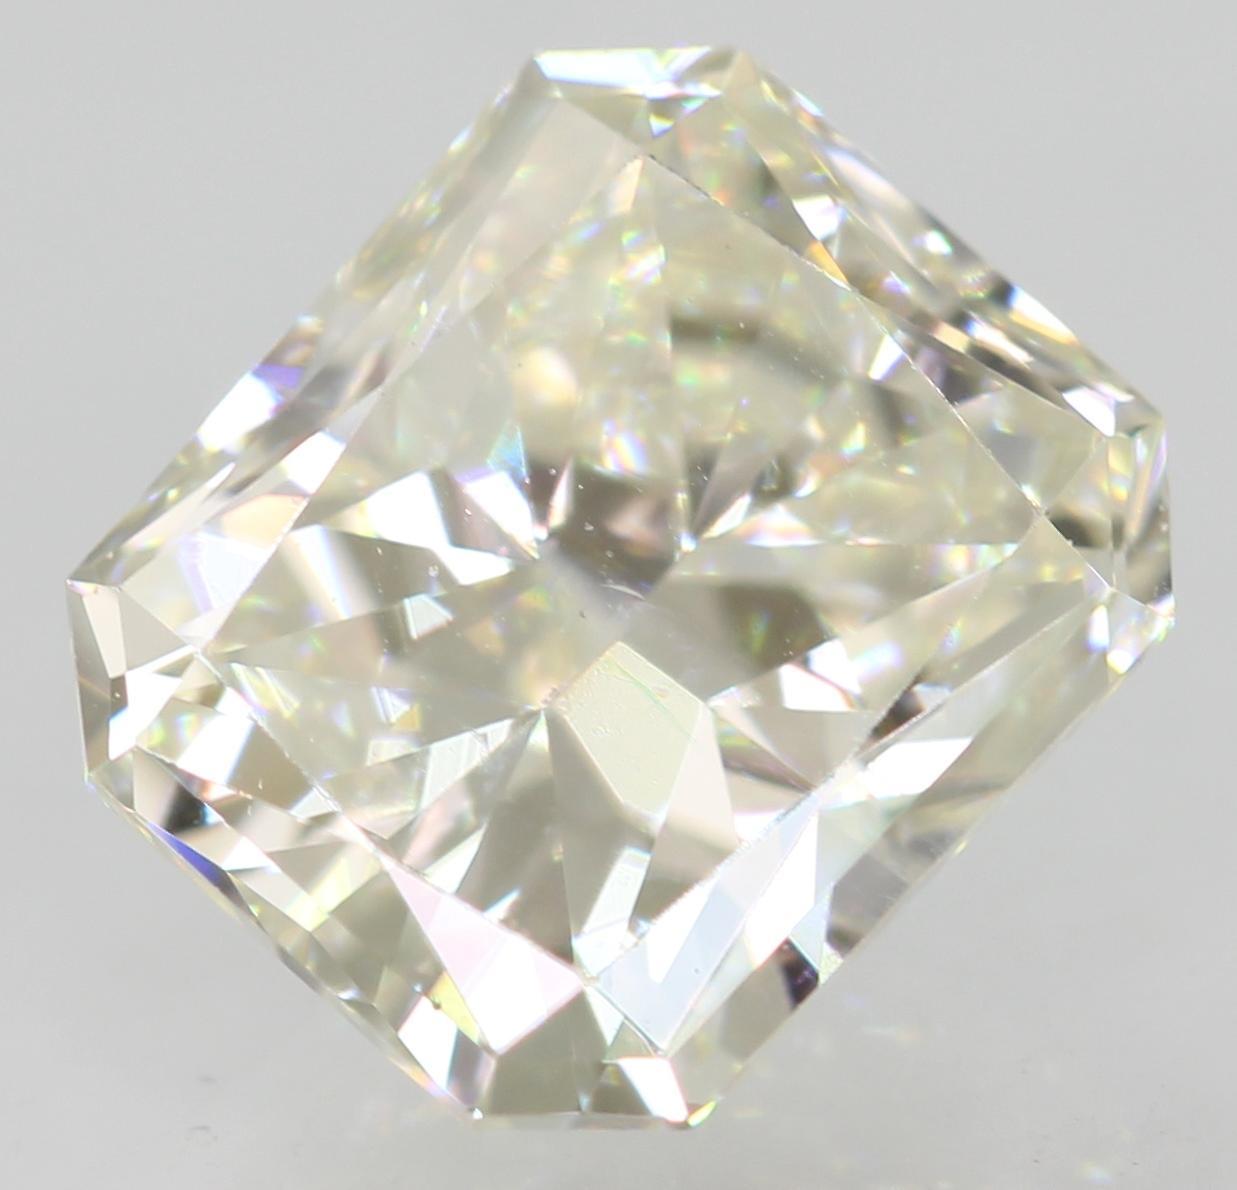 Certified 1.12 Carat H VVS1 Radiant Enhanced Natural Loose Diamond 6.51x5.58mm